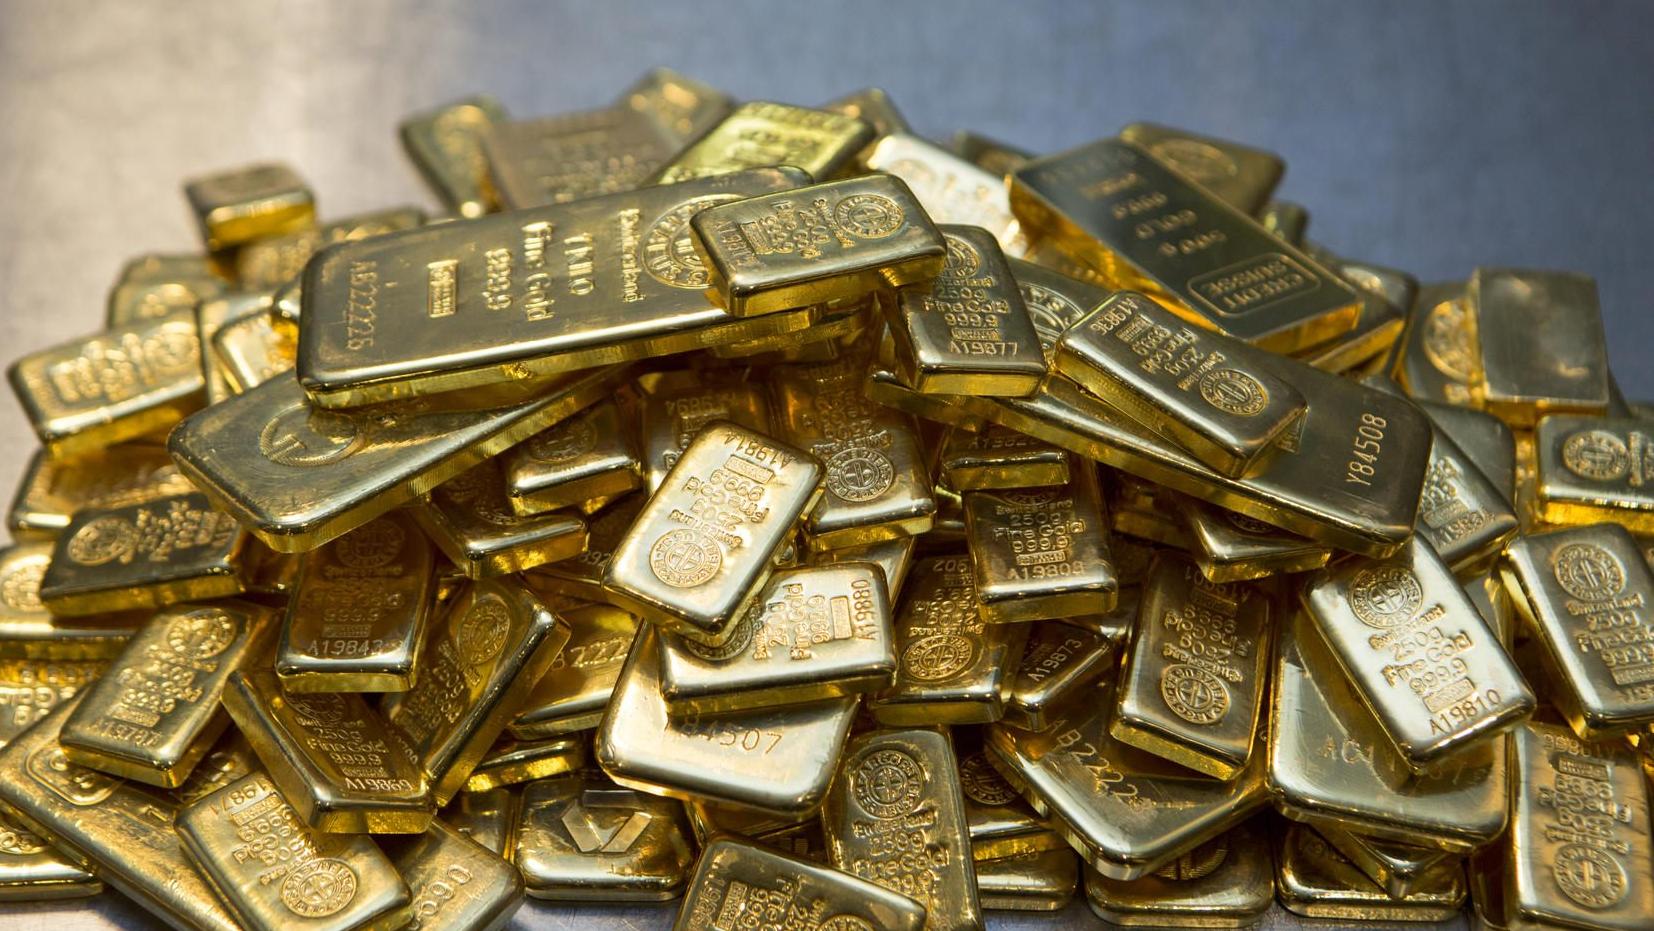 Gangster nehmen Goldhändler-Familie als Geisel